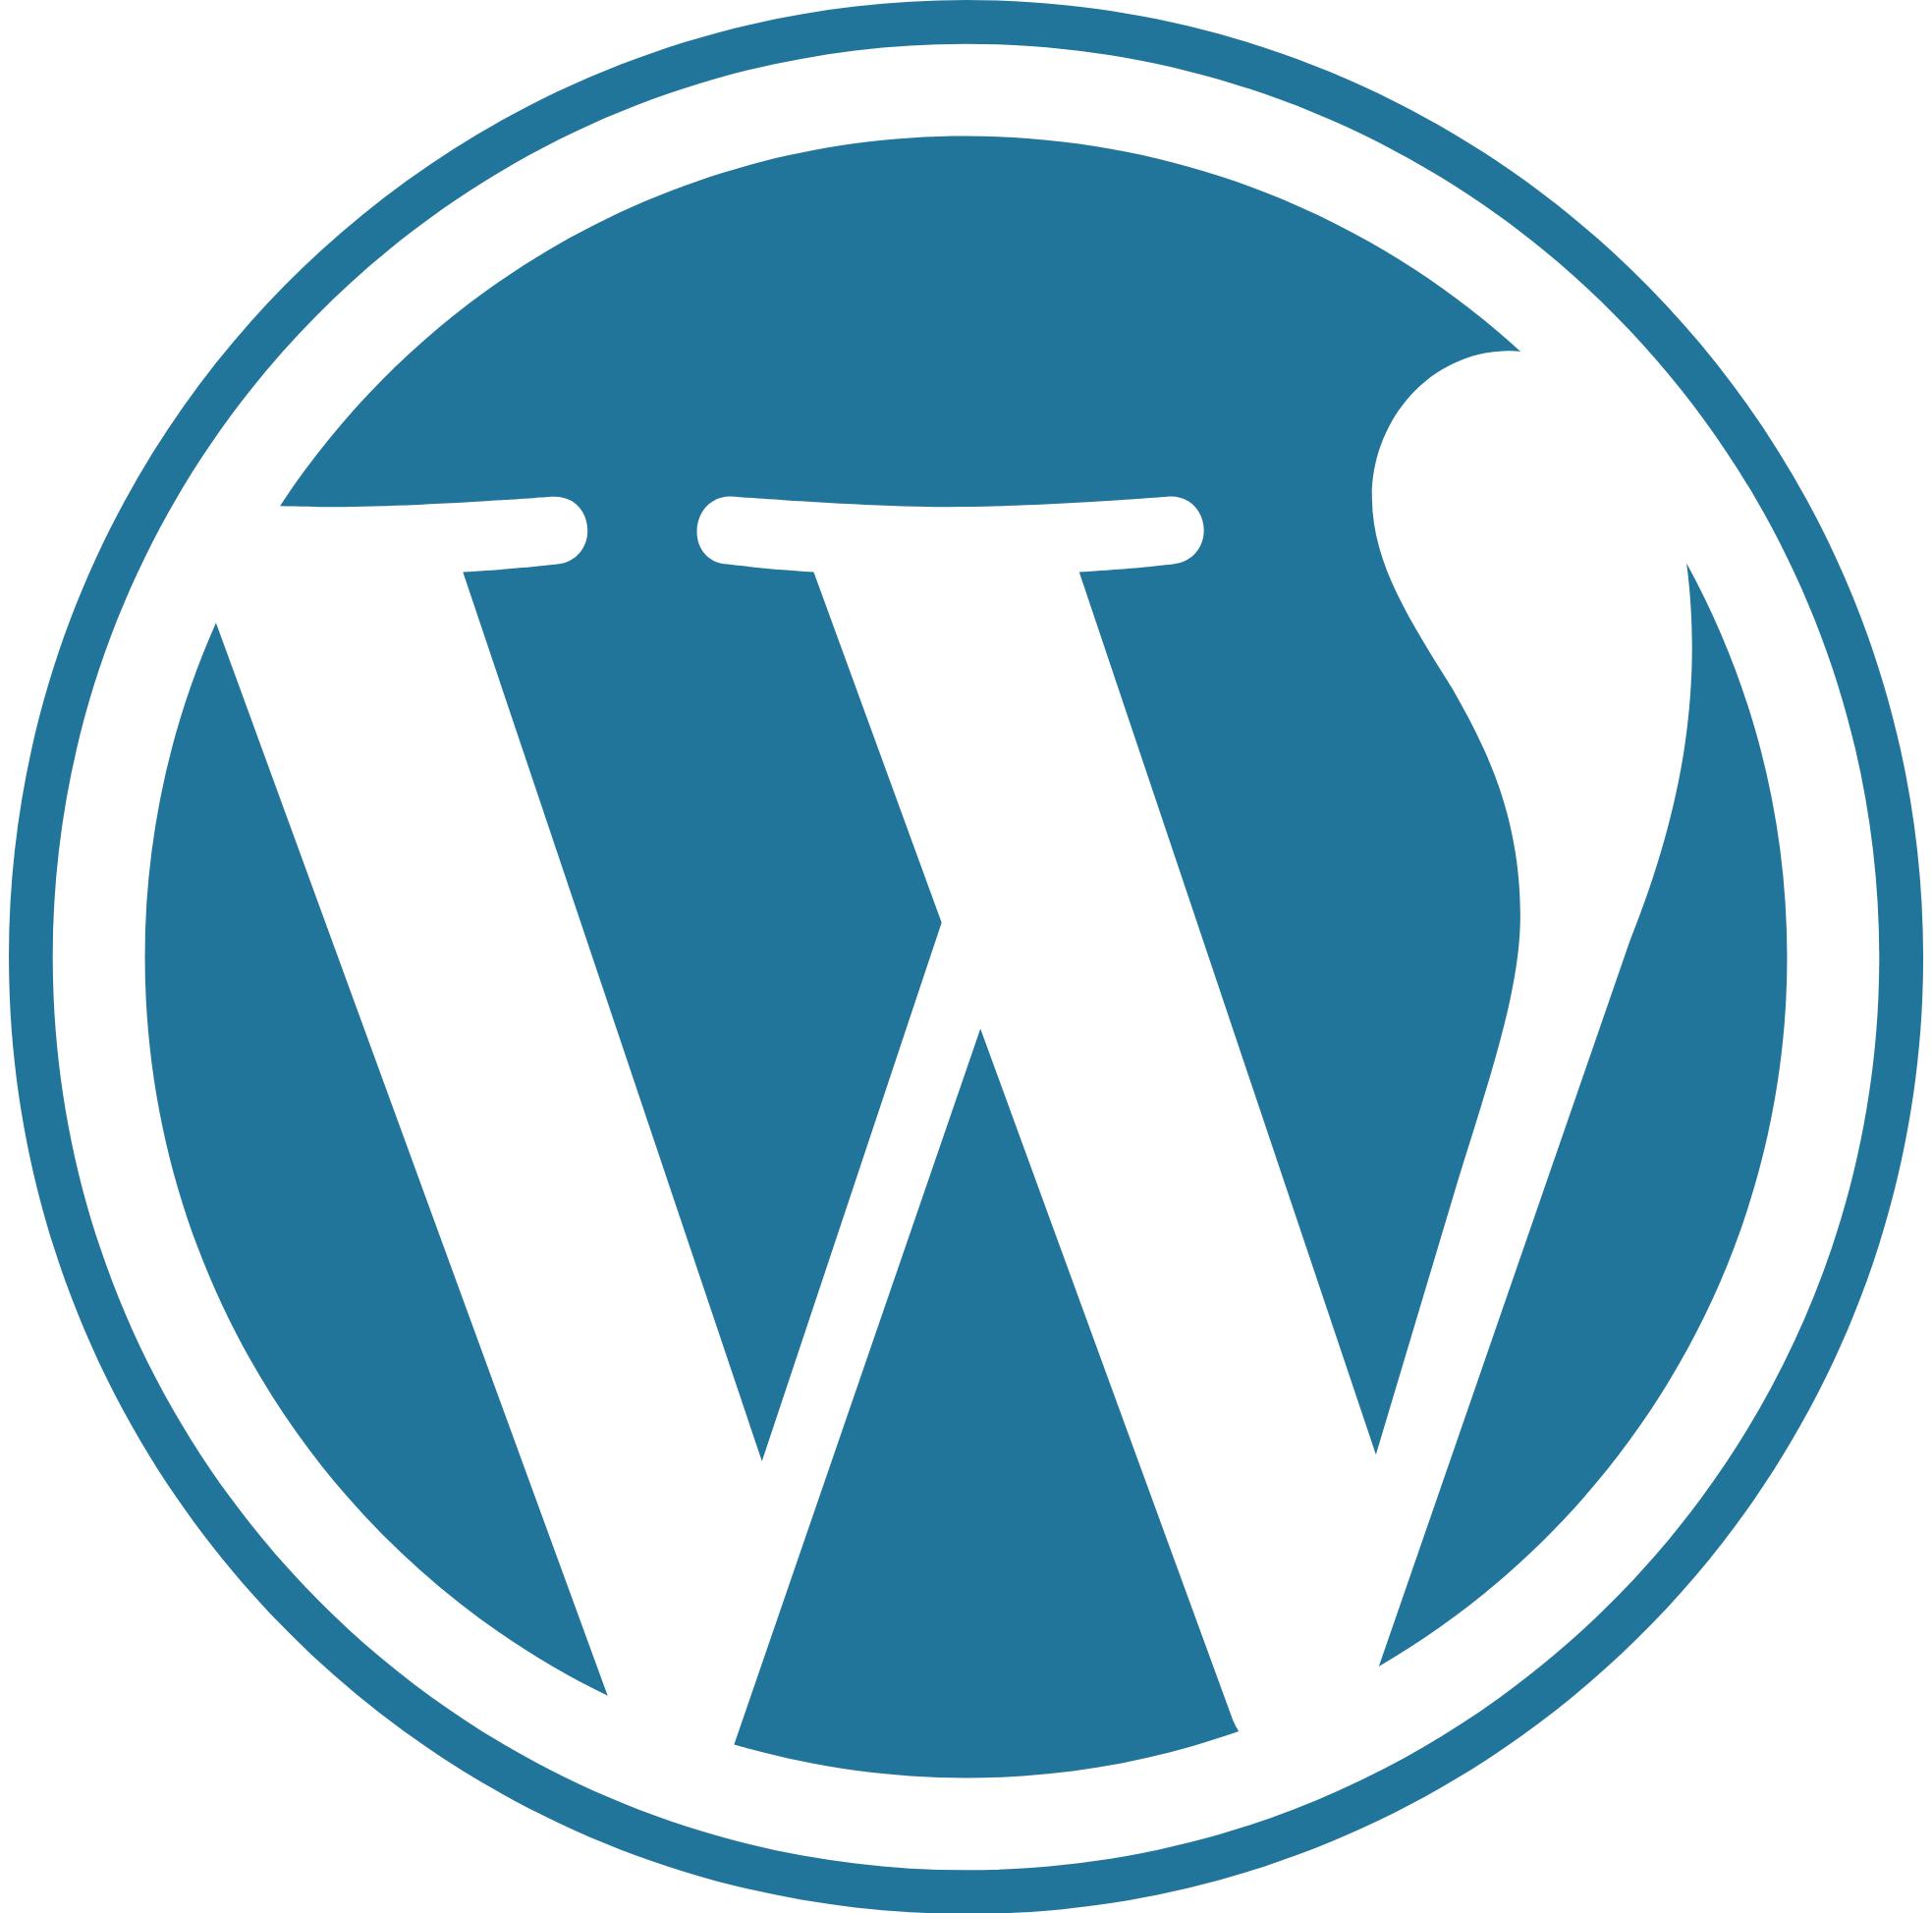 screencapture-upload-wikimedia-org-wikipedia-commons-9-98-WordPress-blue-logo-svg-2020-04-18-16_12_18